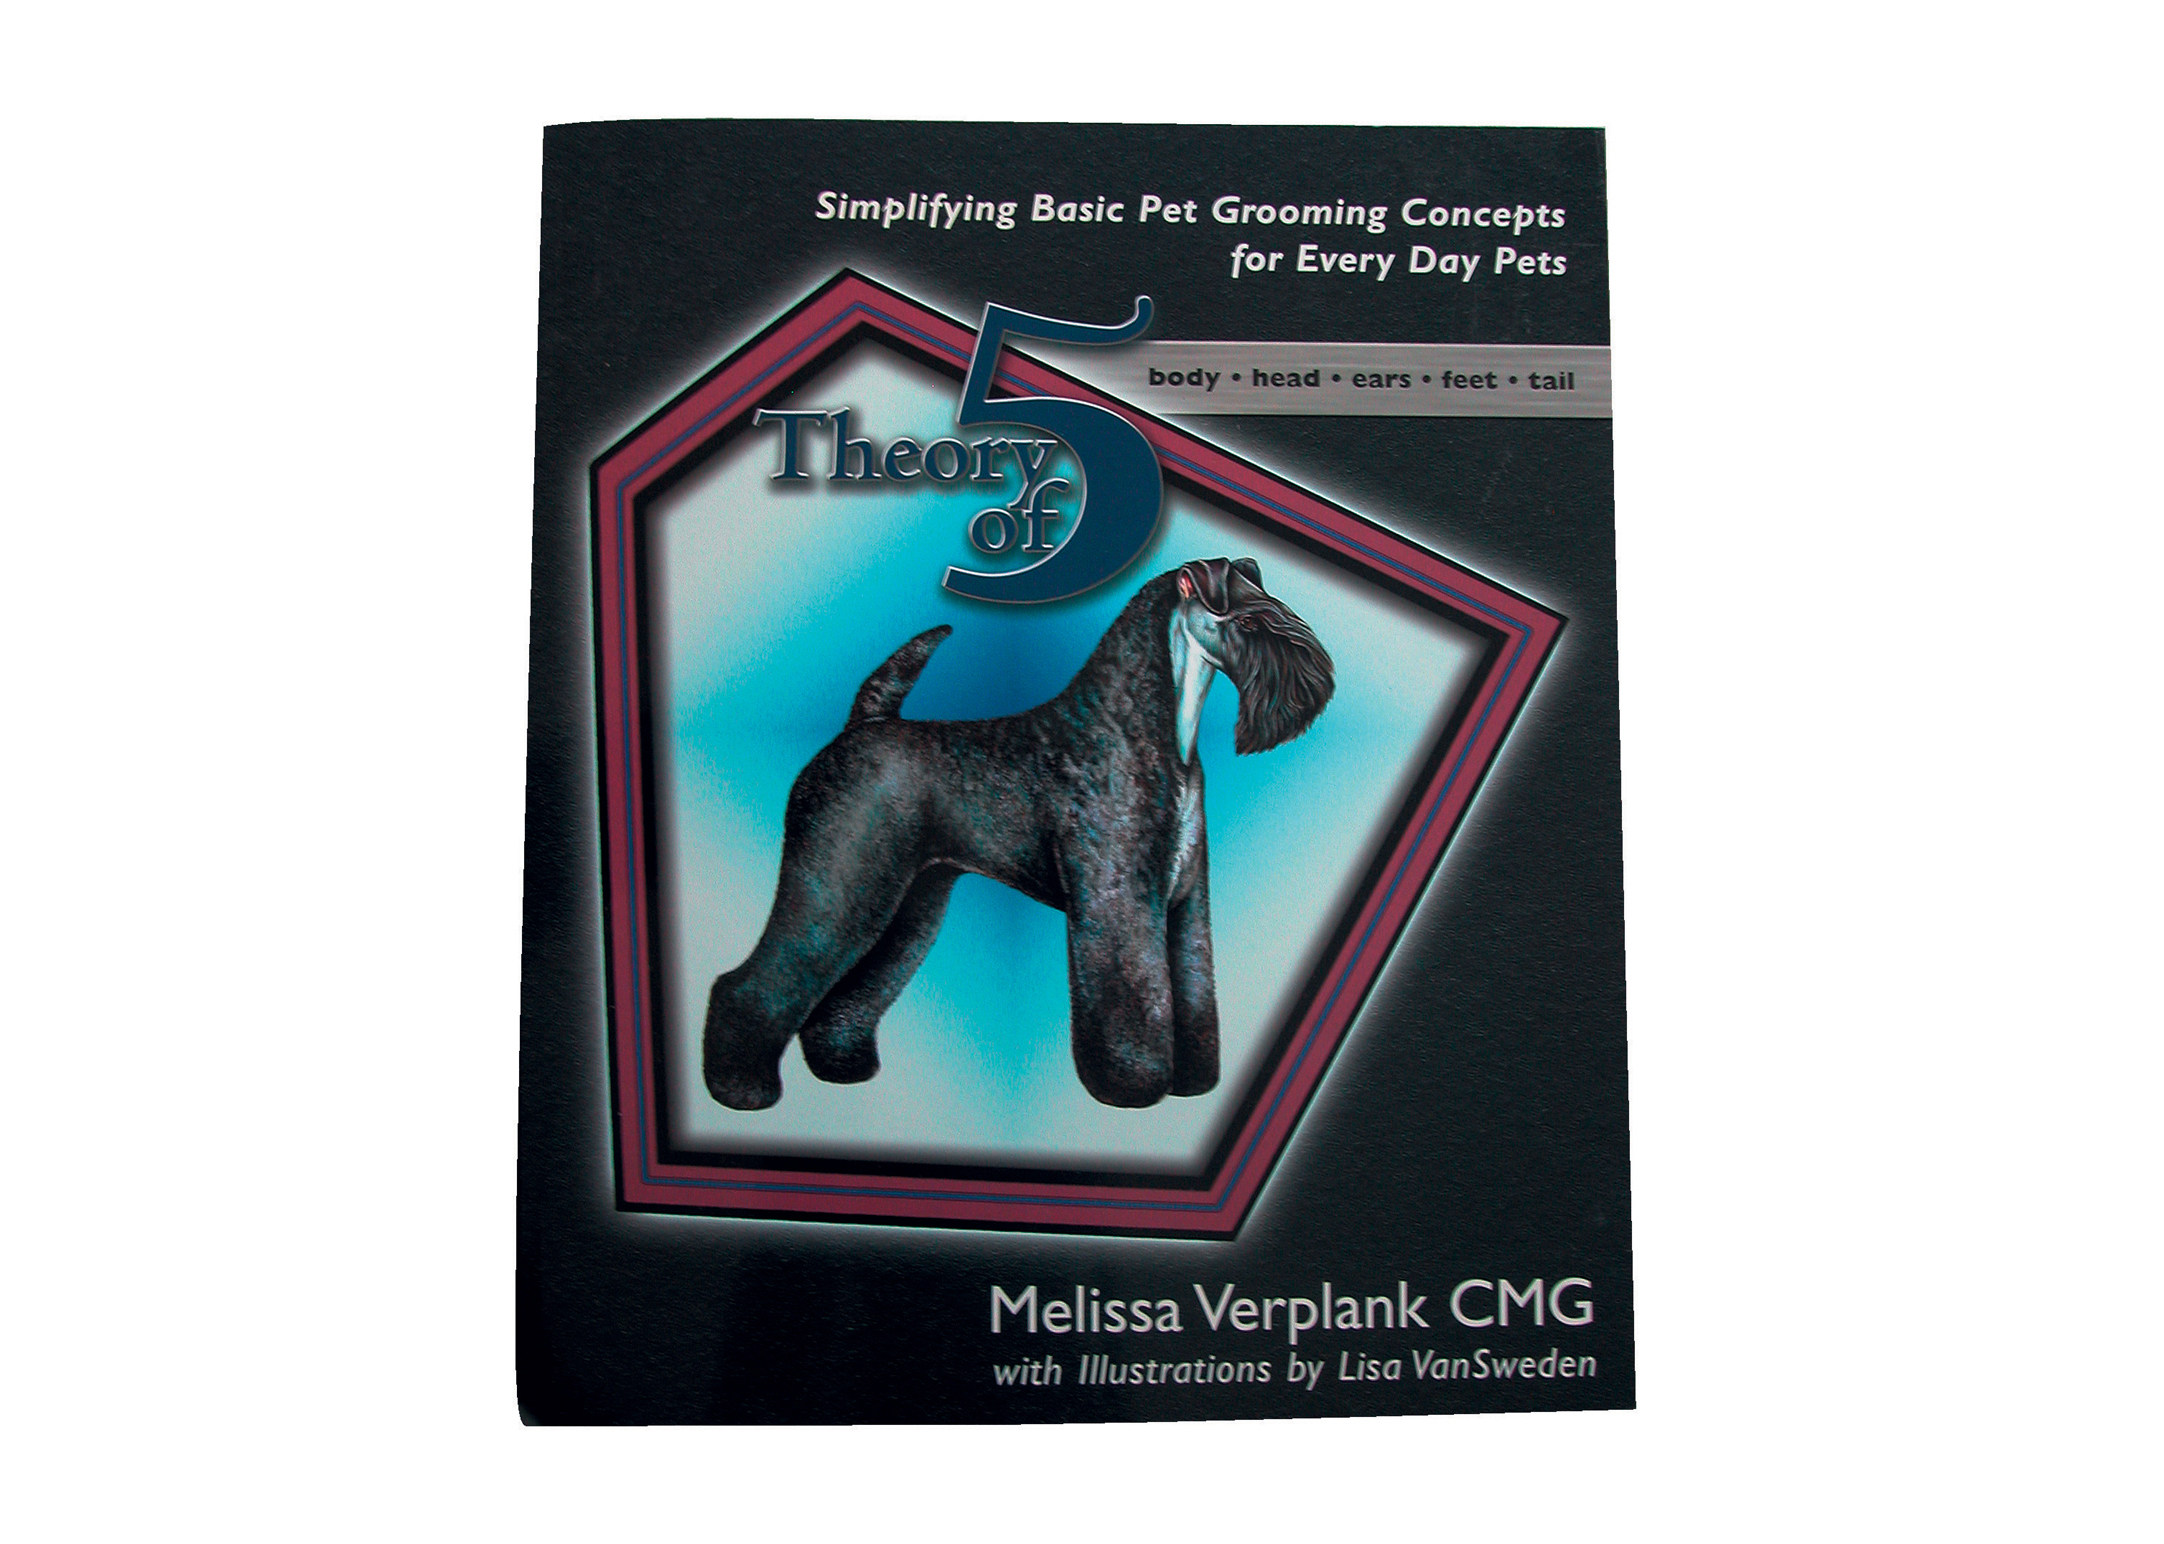 Melissa Verplank Theory of 5 Pet Grooming Manual Educational Book